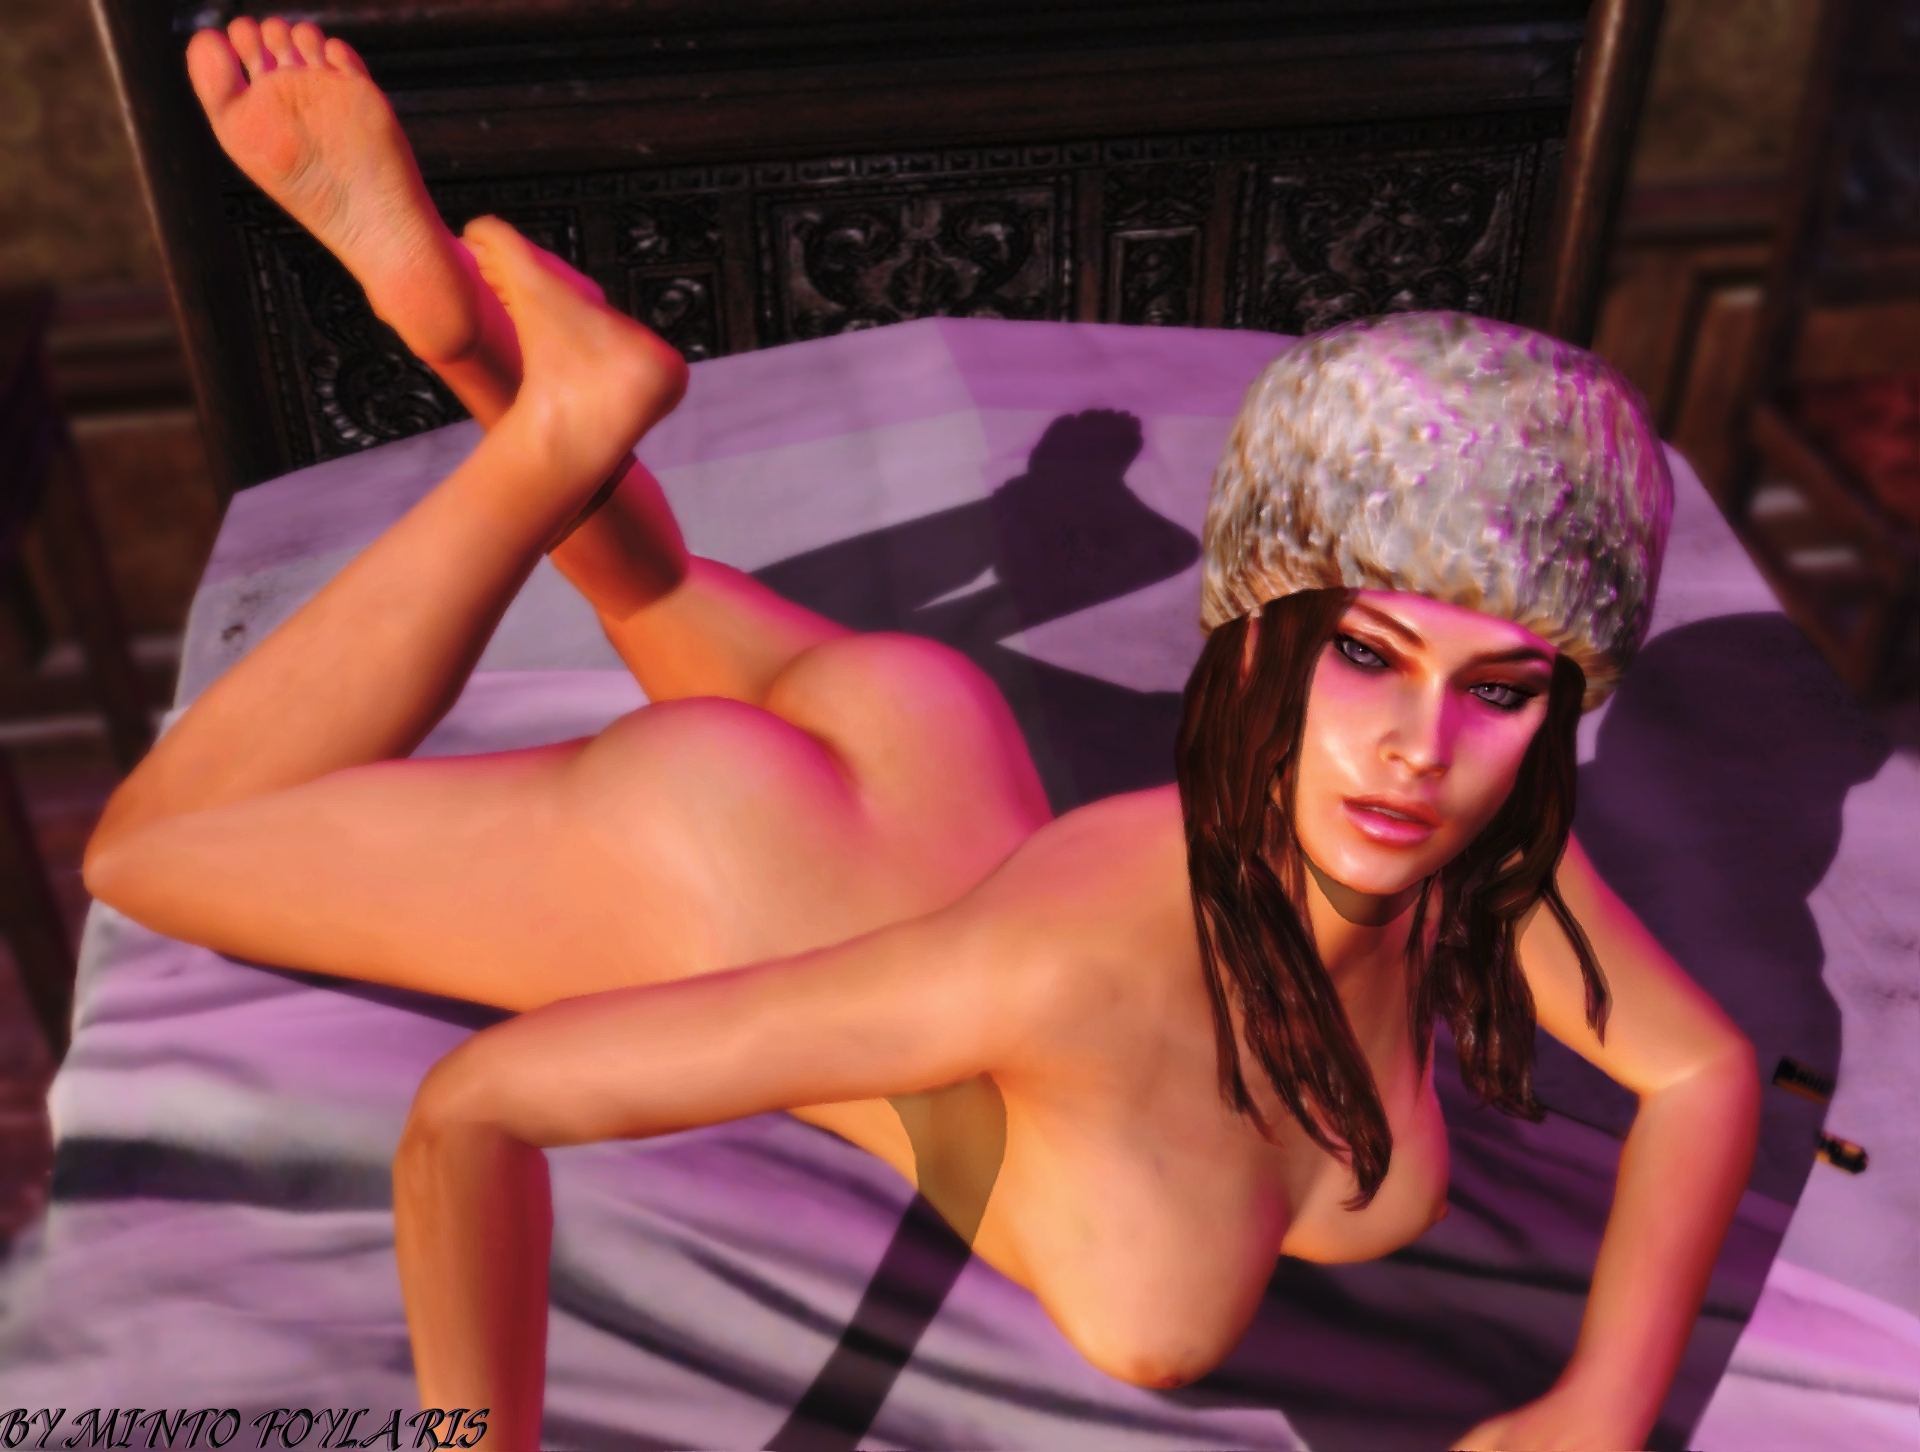 Resident evil porn jessica nackt video